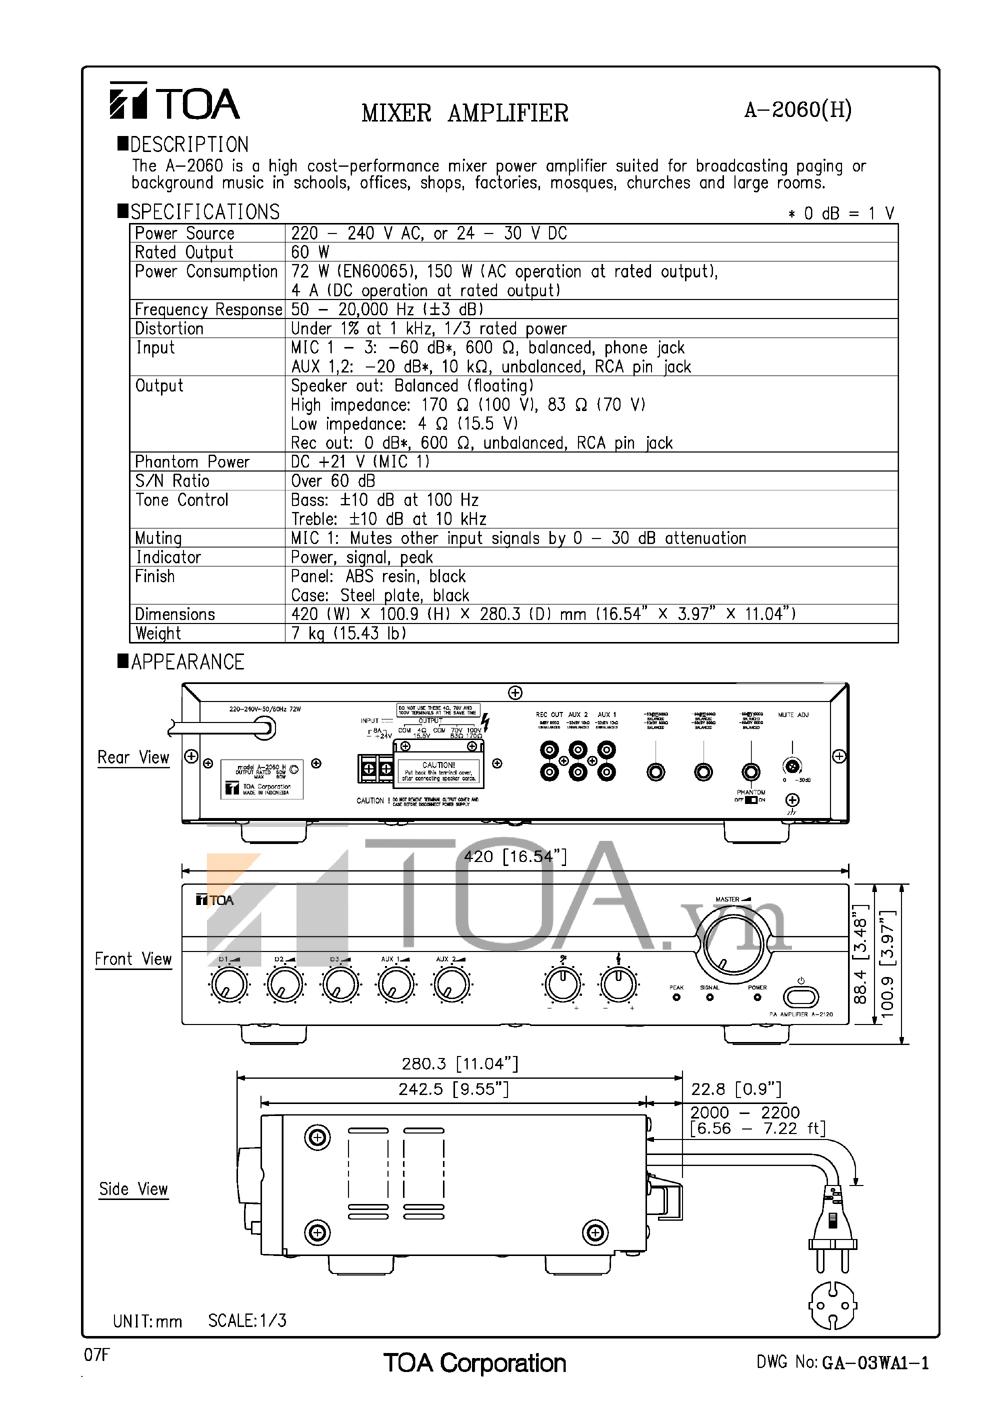 A-2060